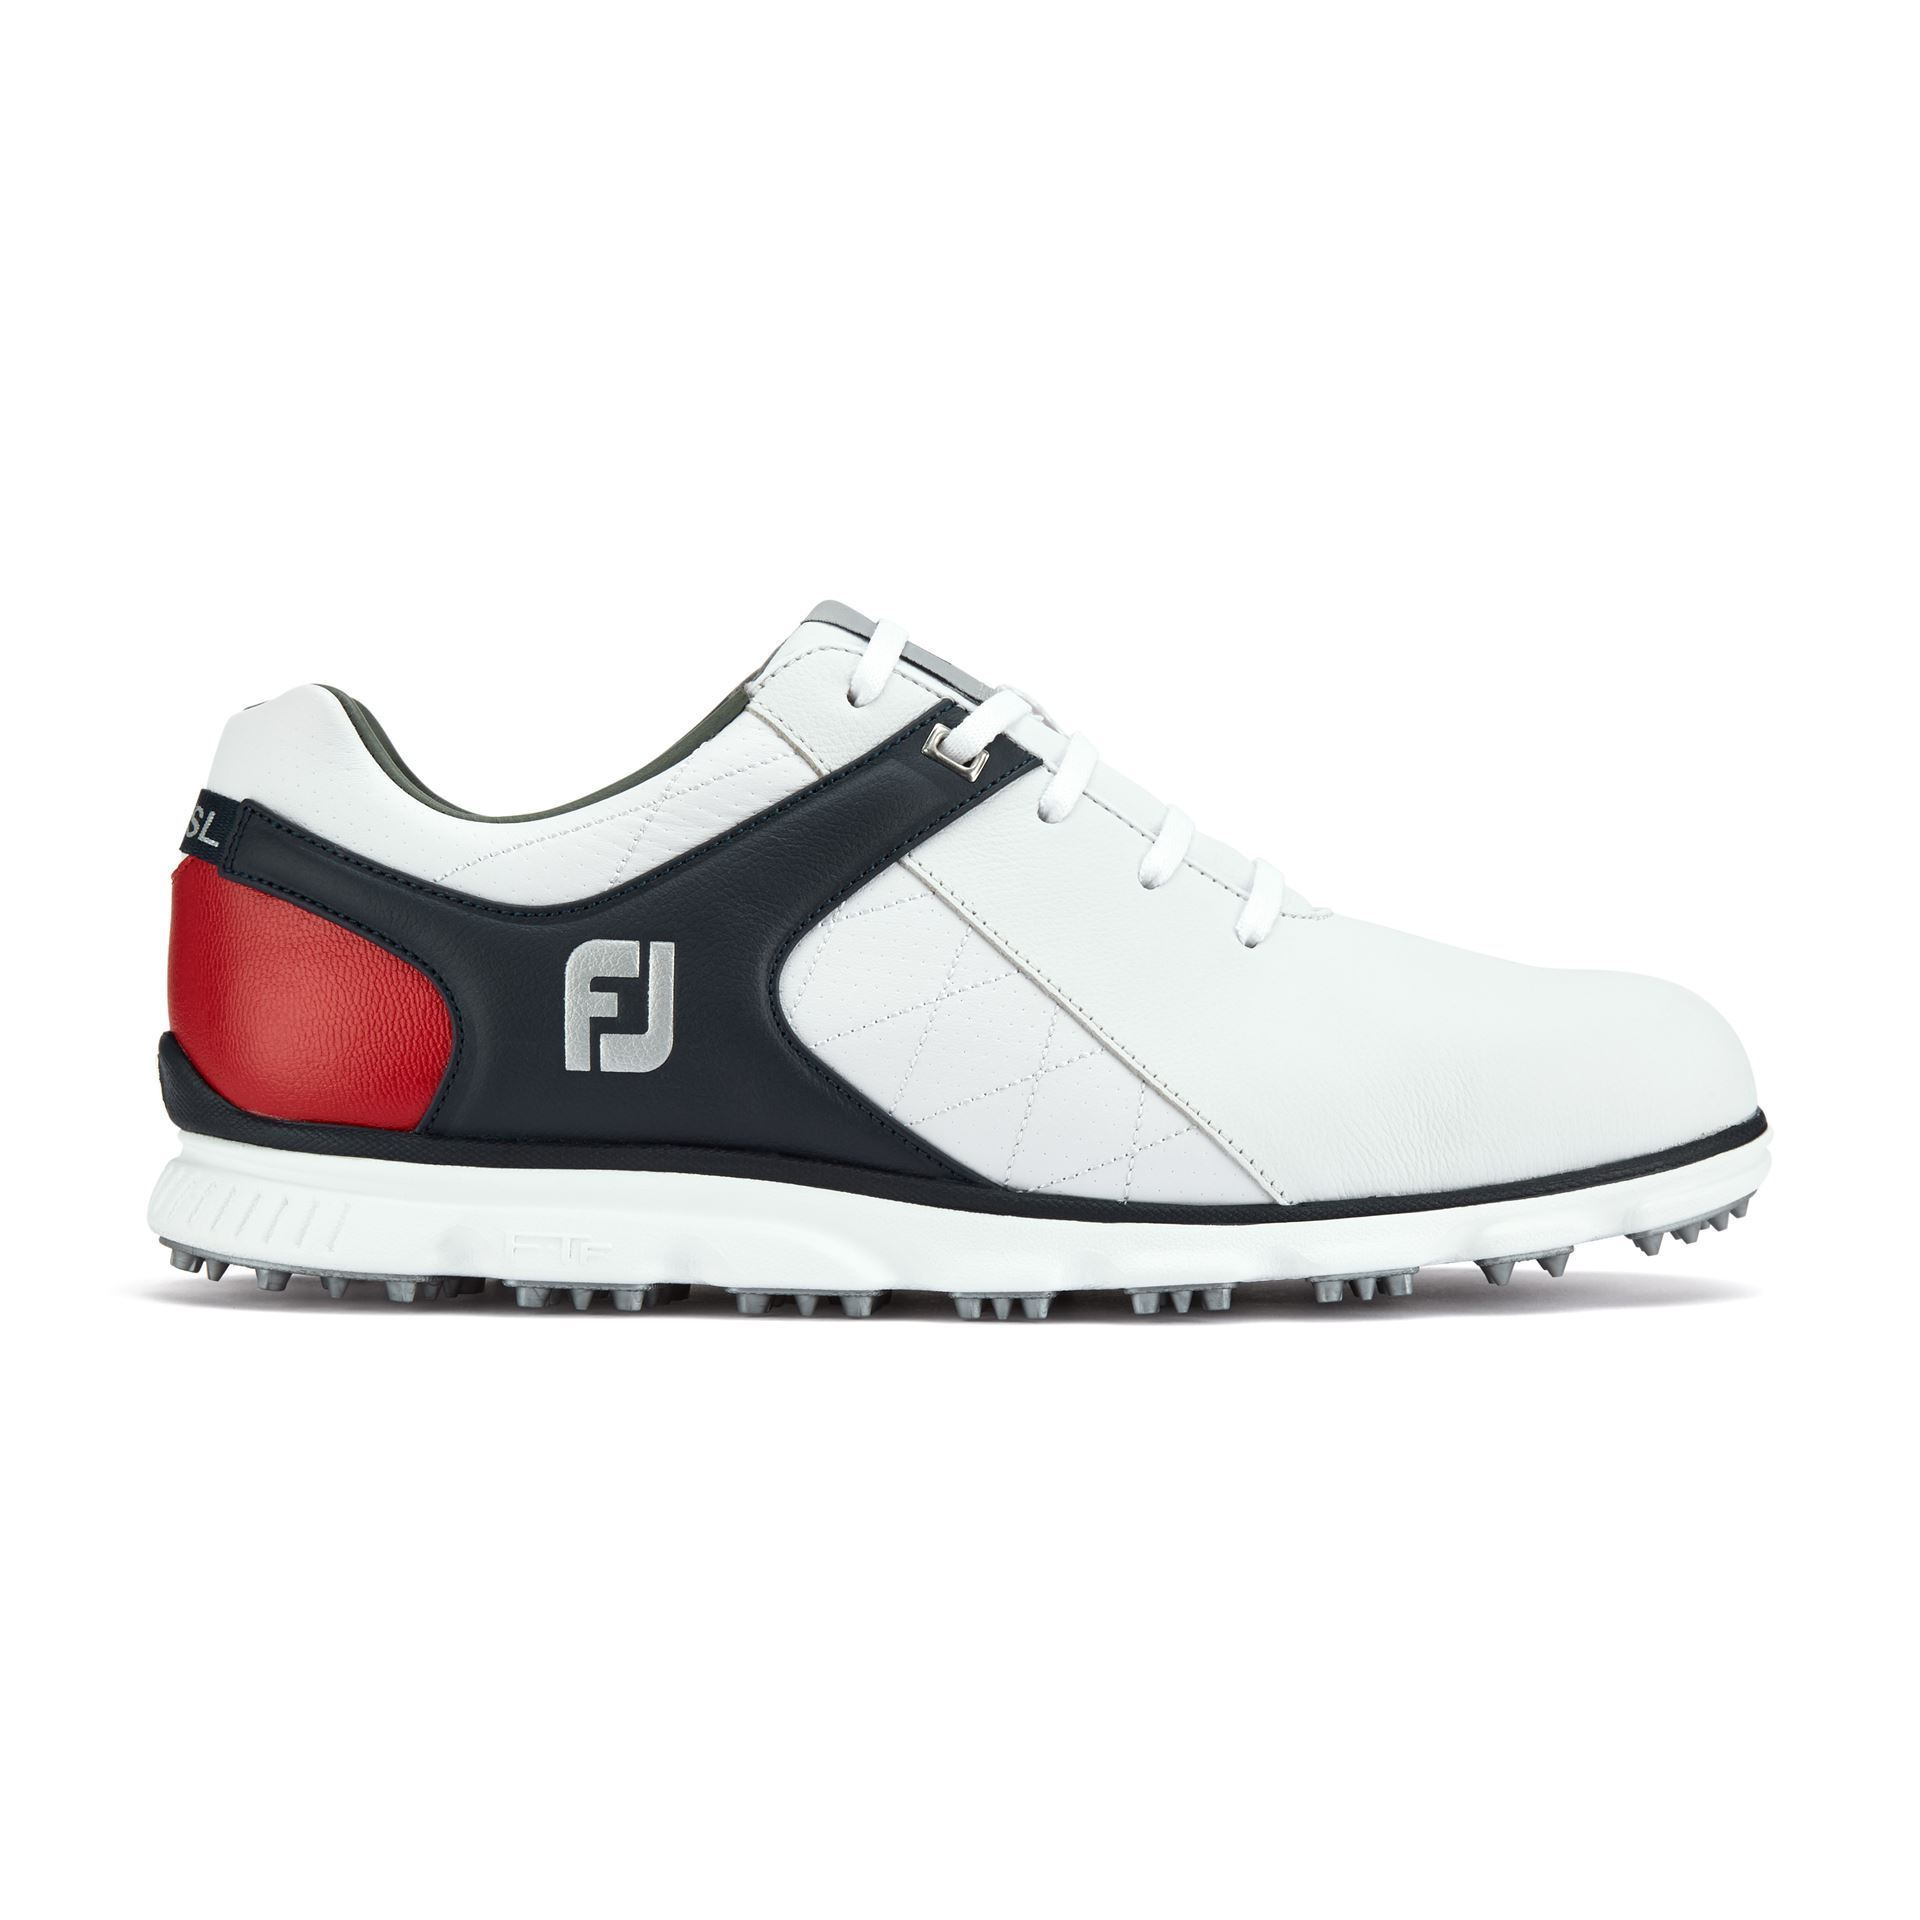 e5b88d52e36fb1 Footjoy Pro SL Golf Shoes 53496 - Next Day Delivery Golf Equipment